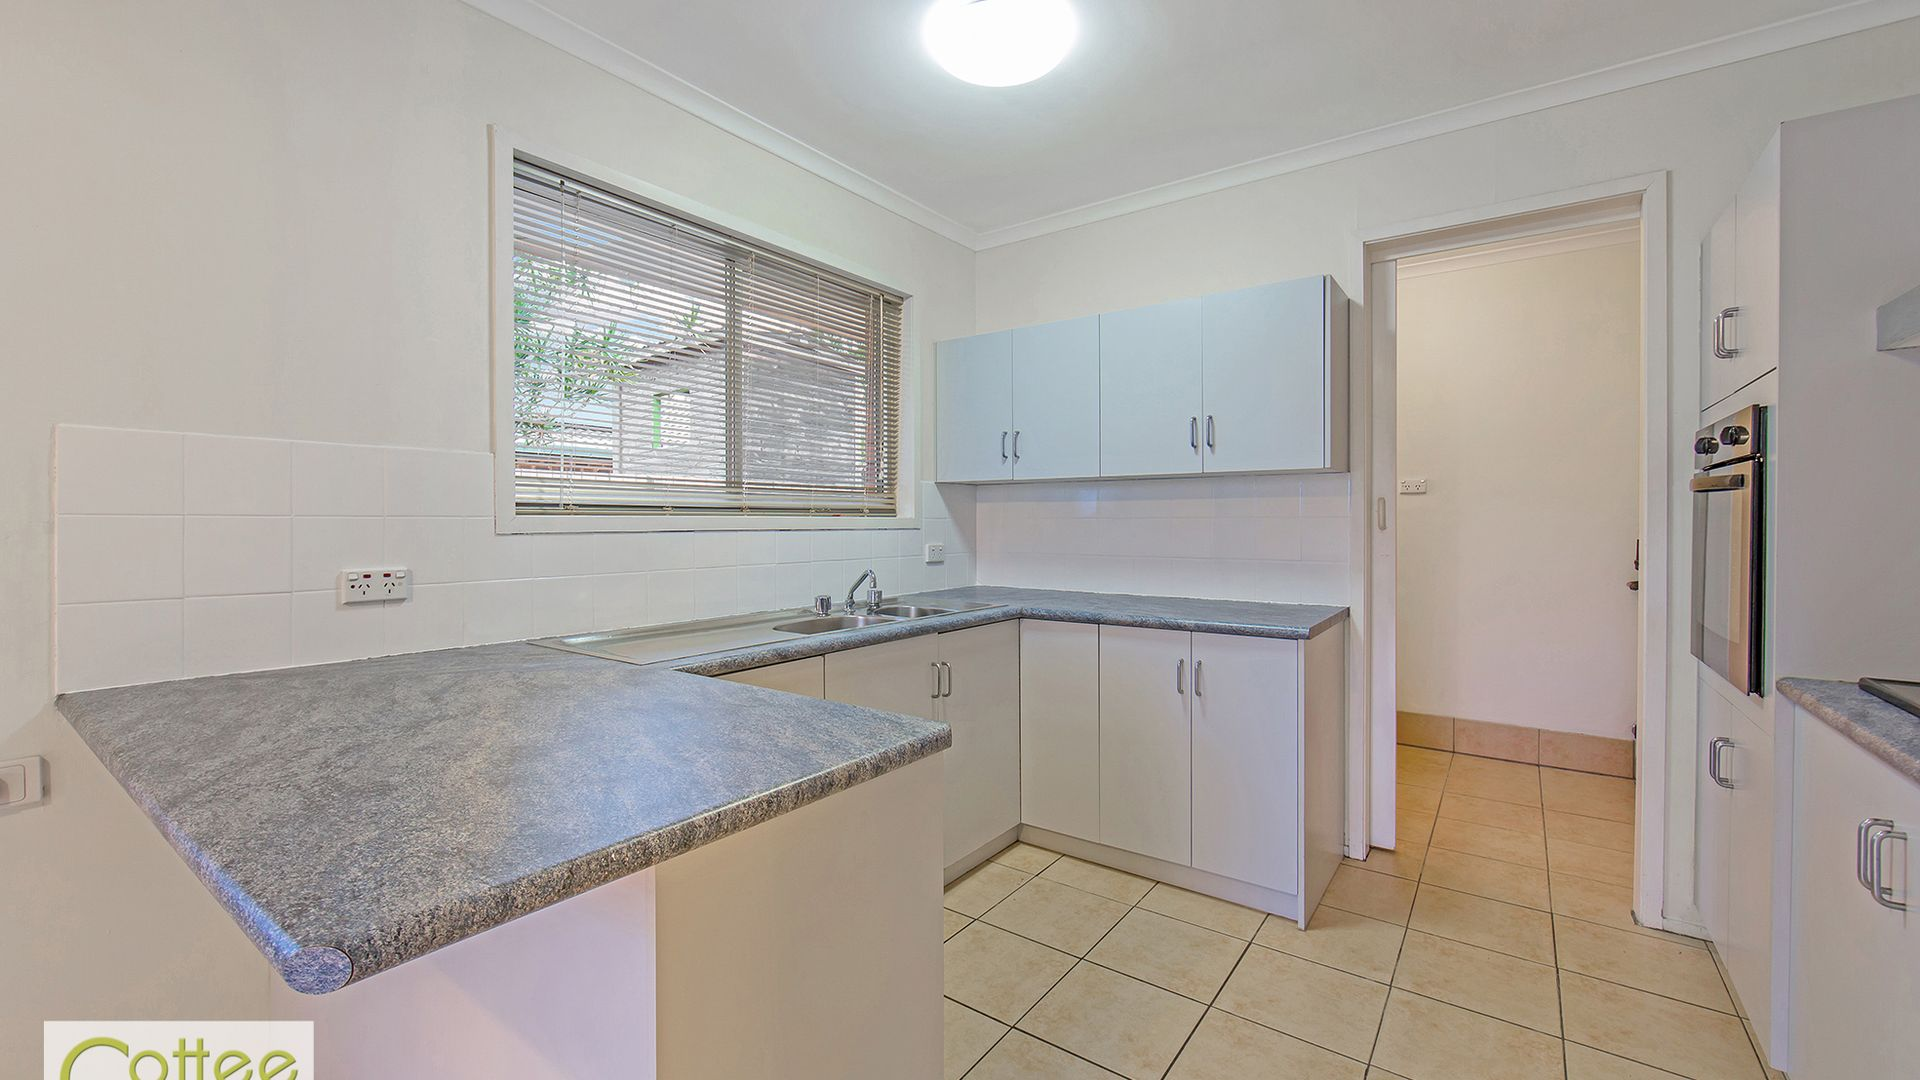 53 ATTUNGA STREET, Bald Hills QLD 4036, Image 2